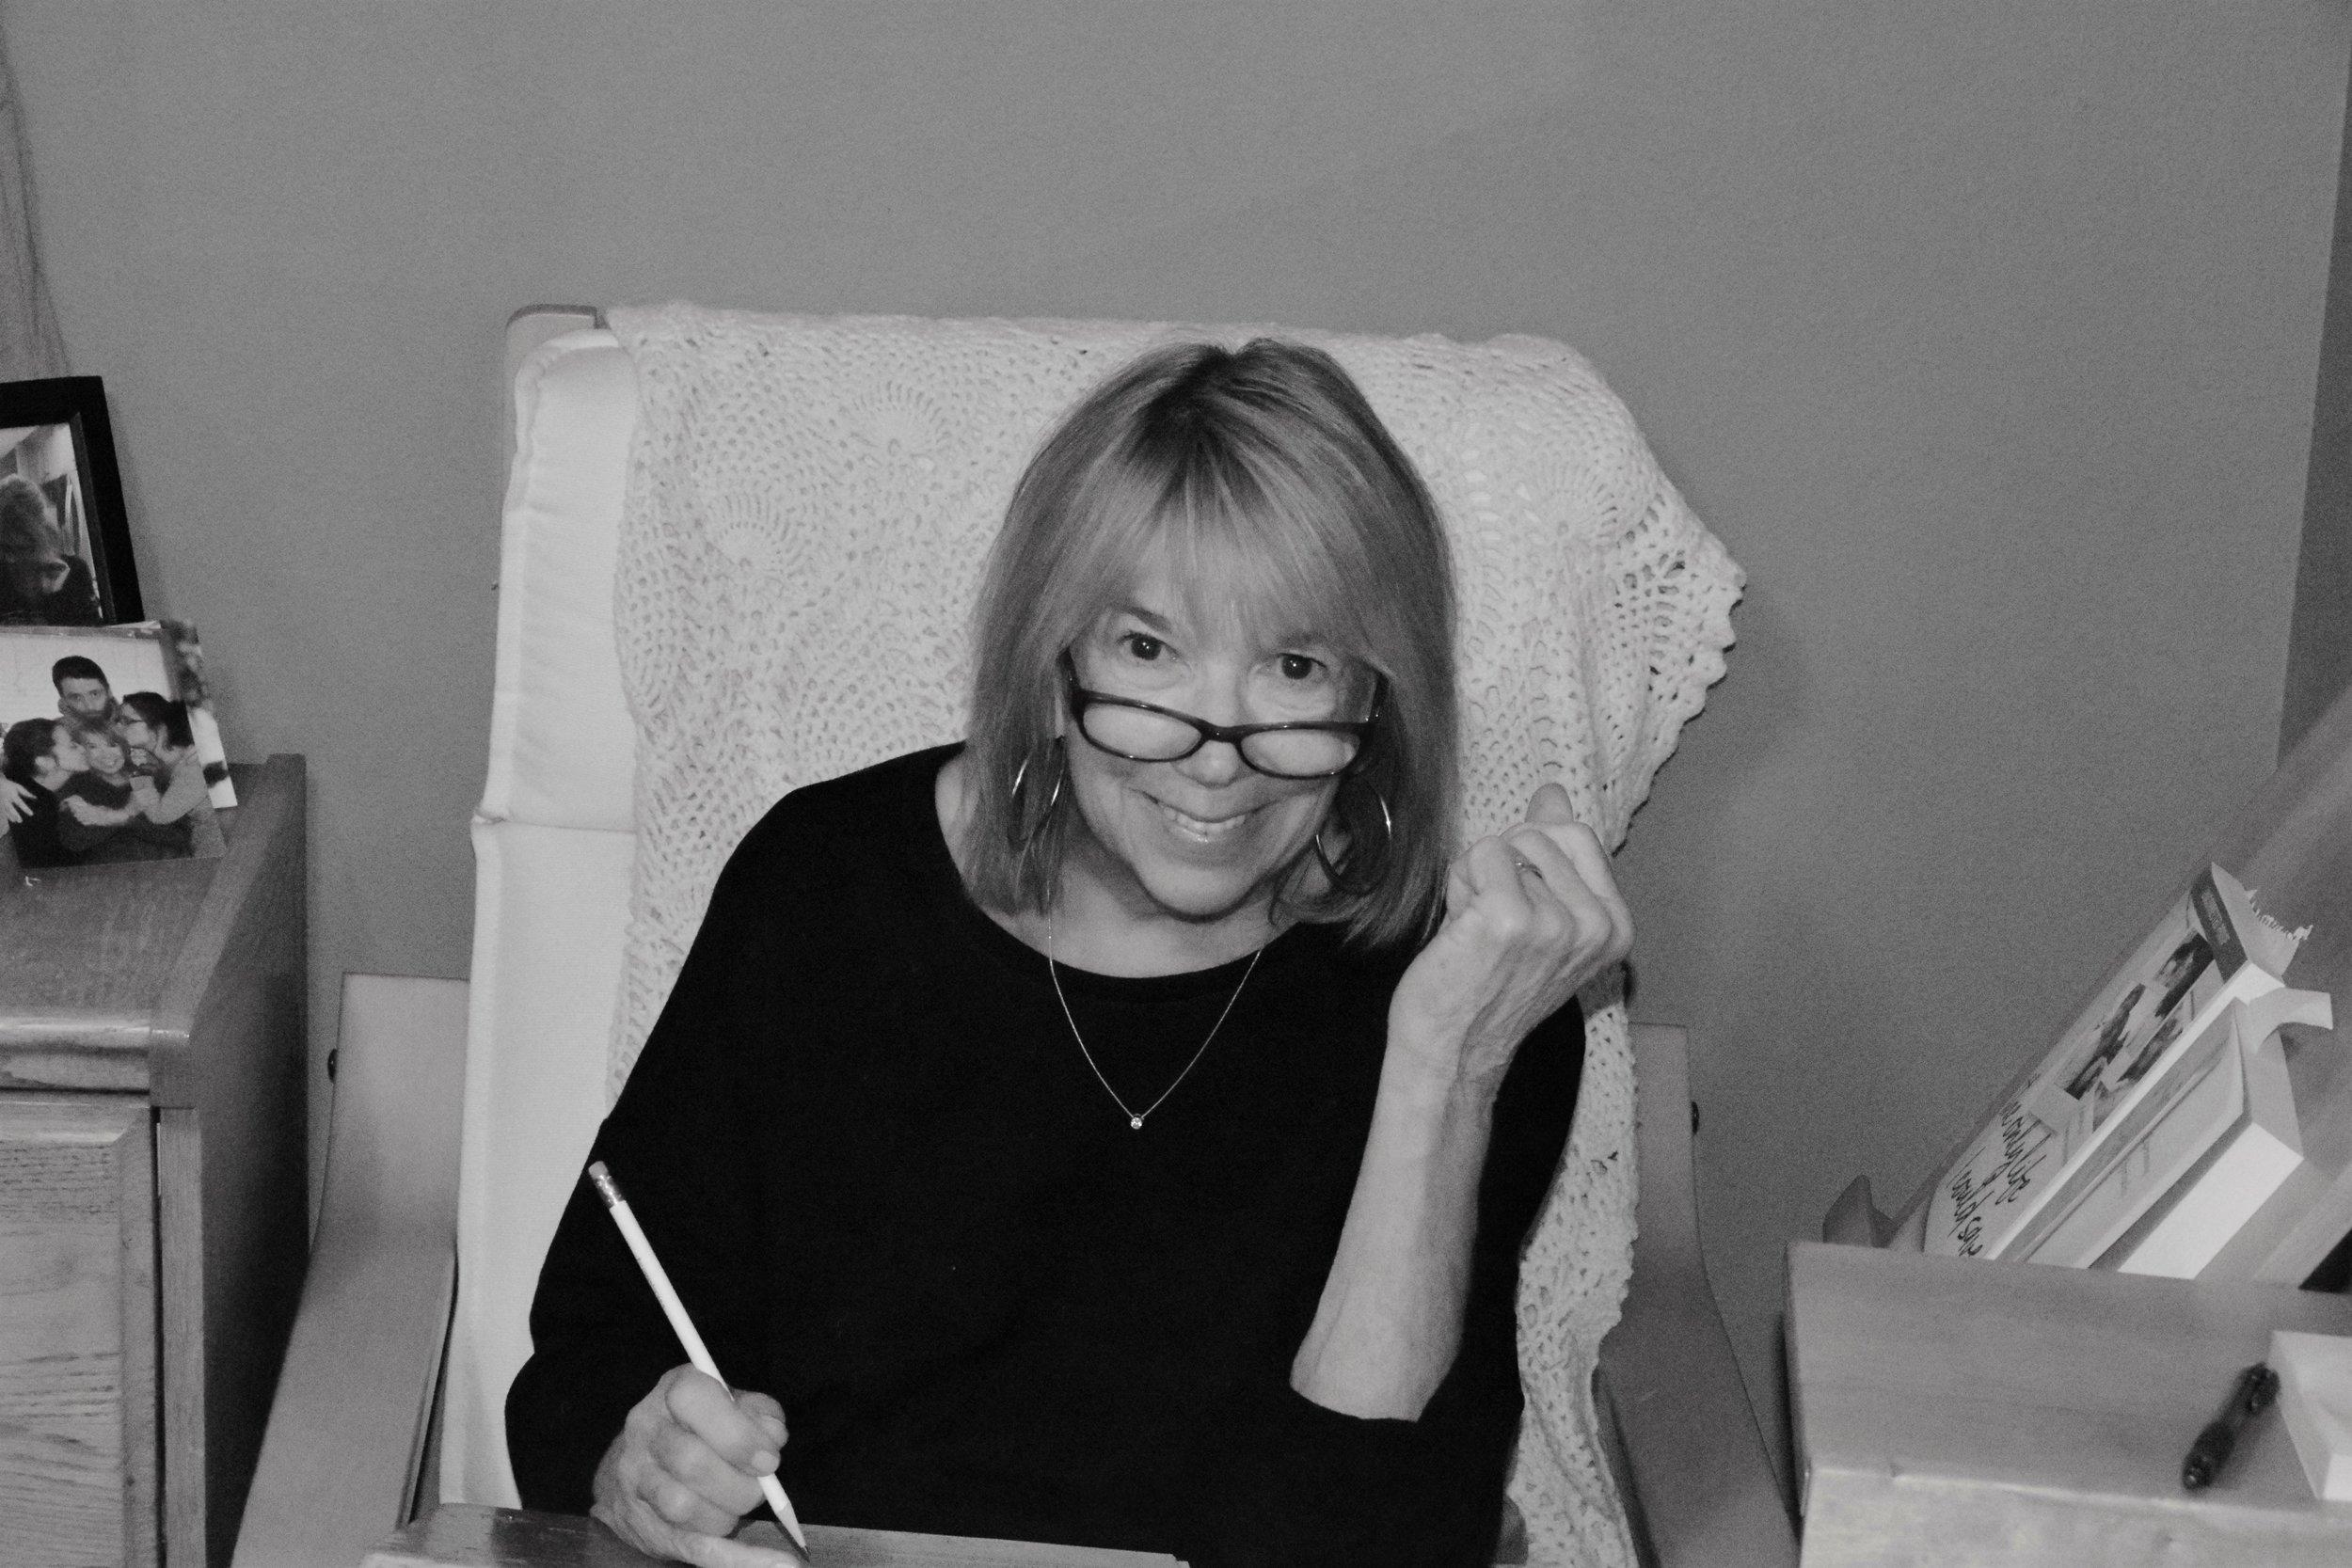 Kathy Ketcham photo 2019.JPG